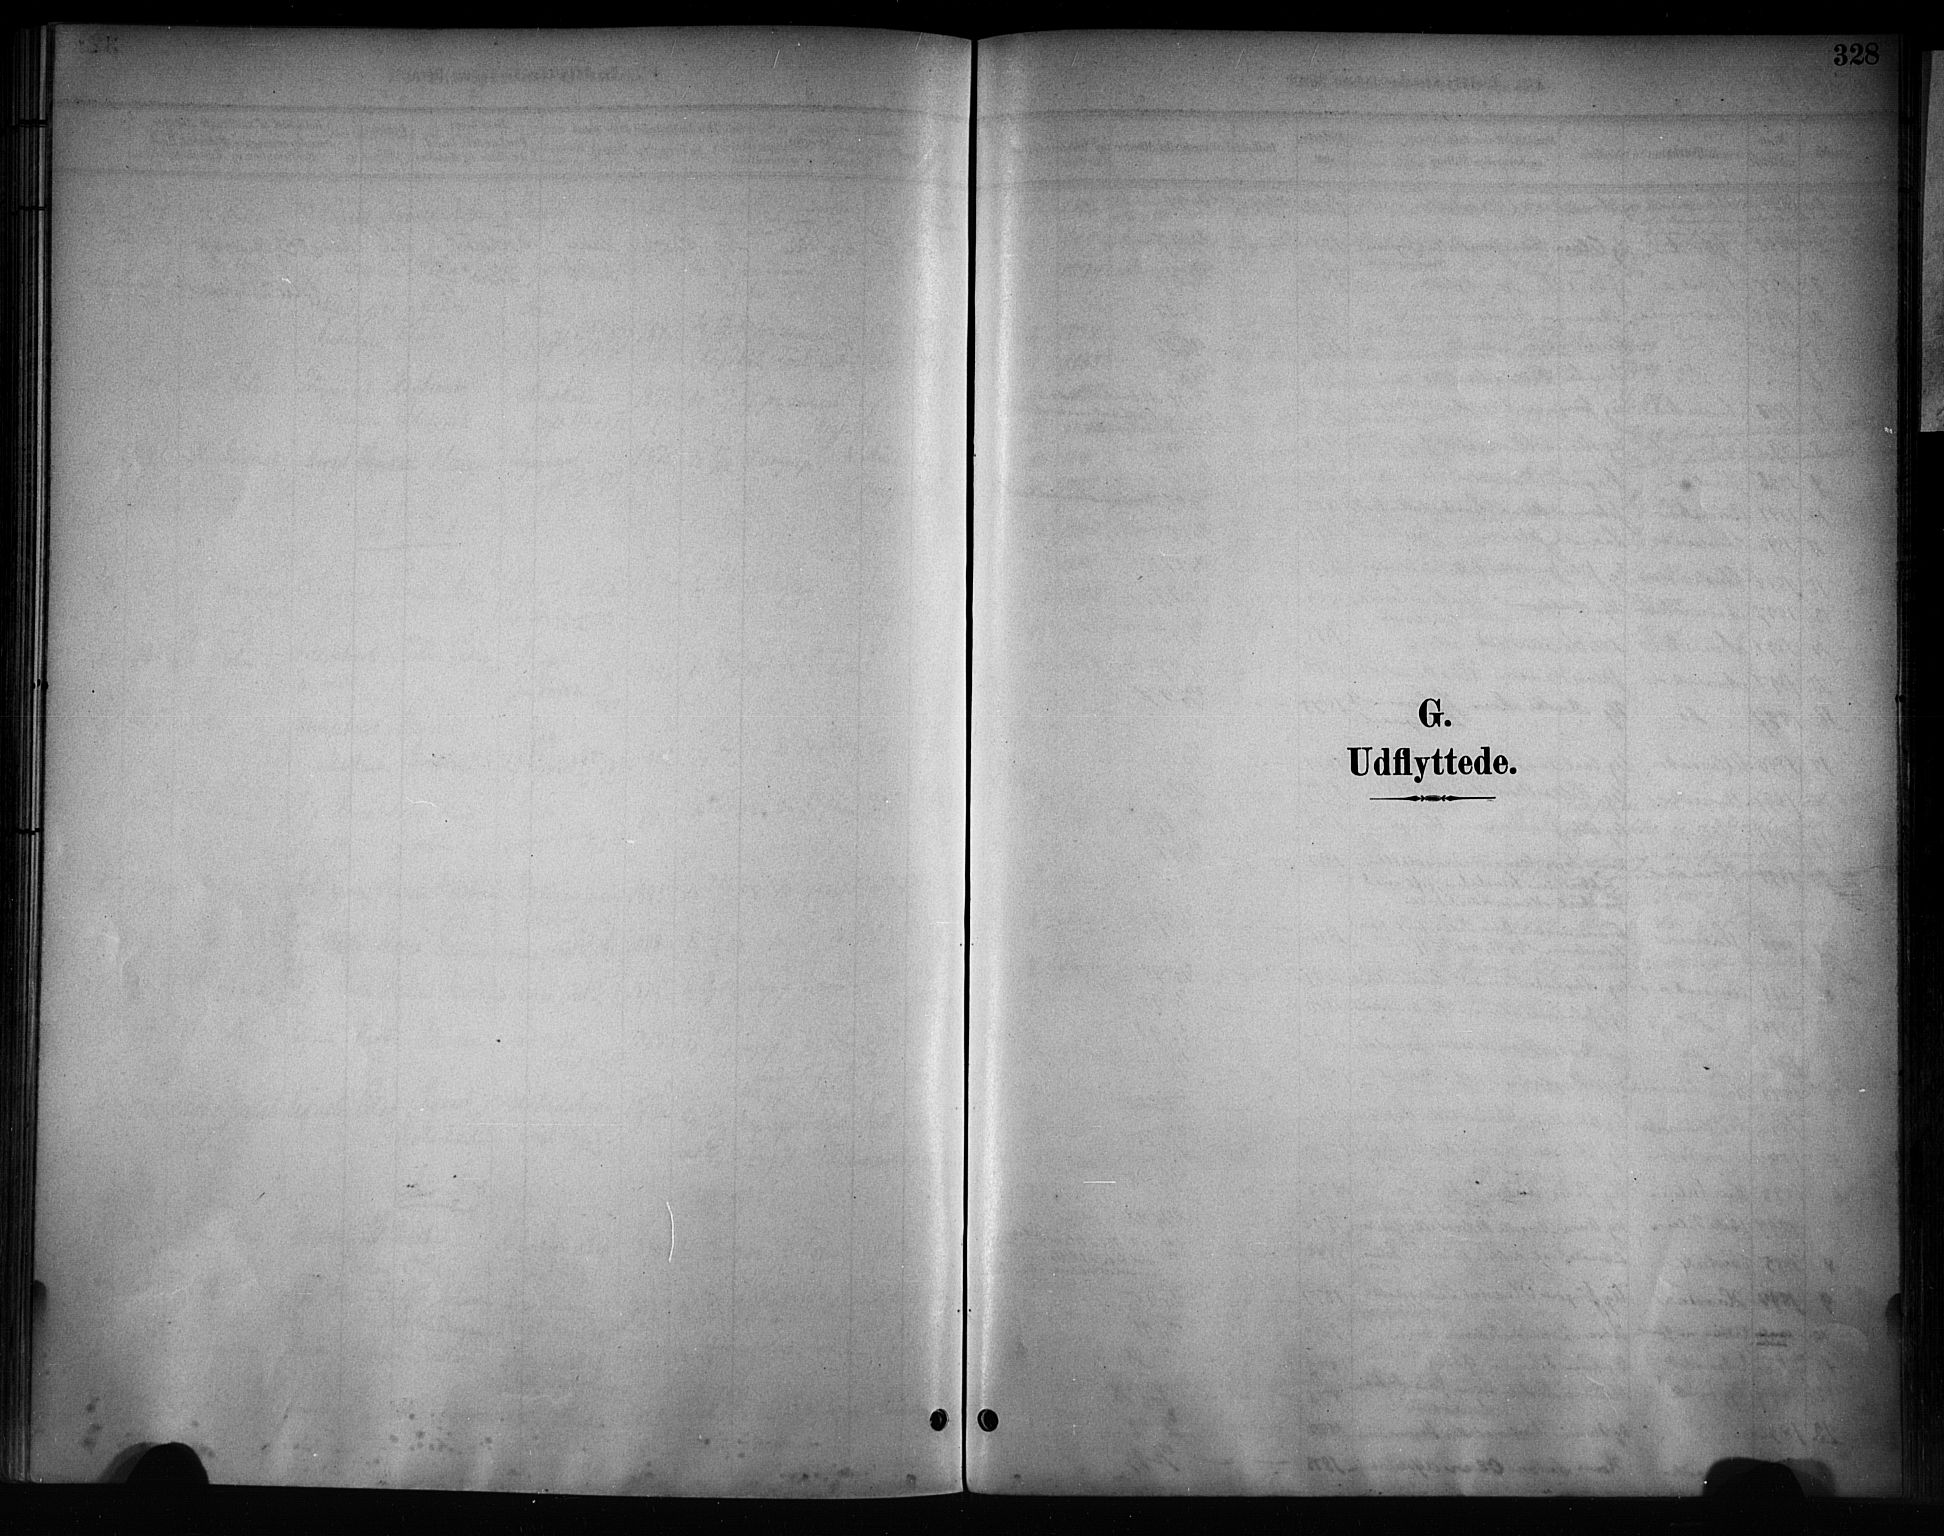 SAH, Østre Toten prestekontor, Ministerialbok nr. 8, 1897-1909, s. 328